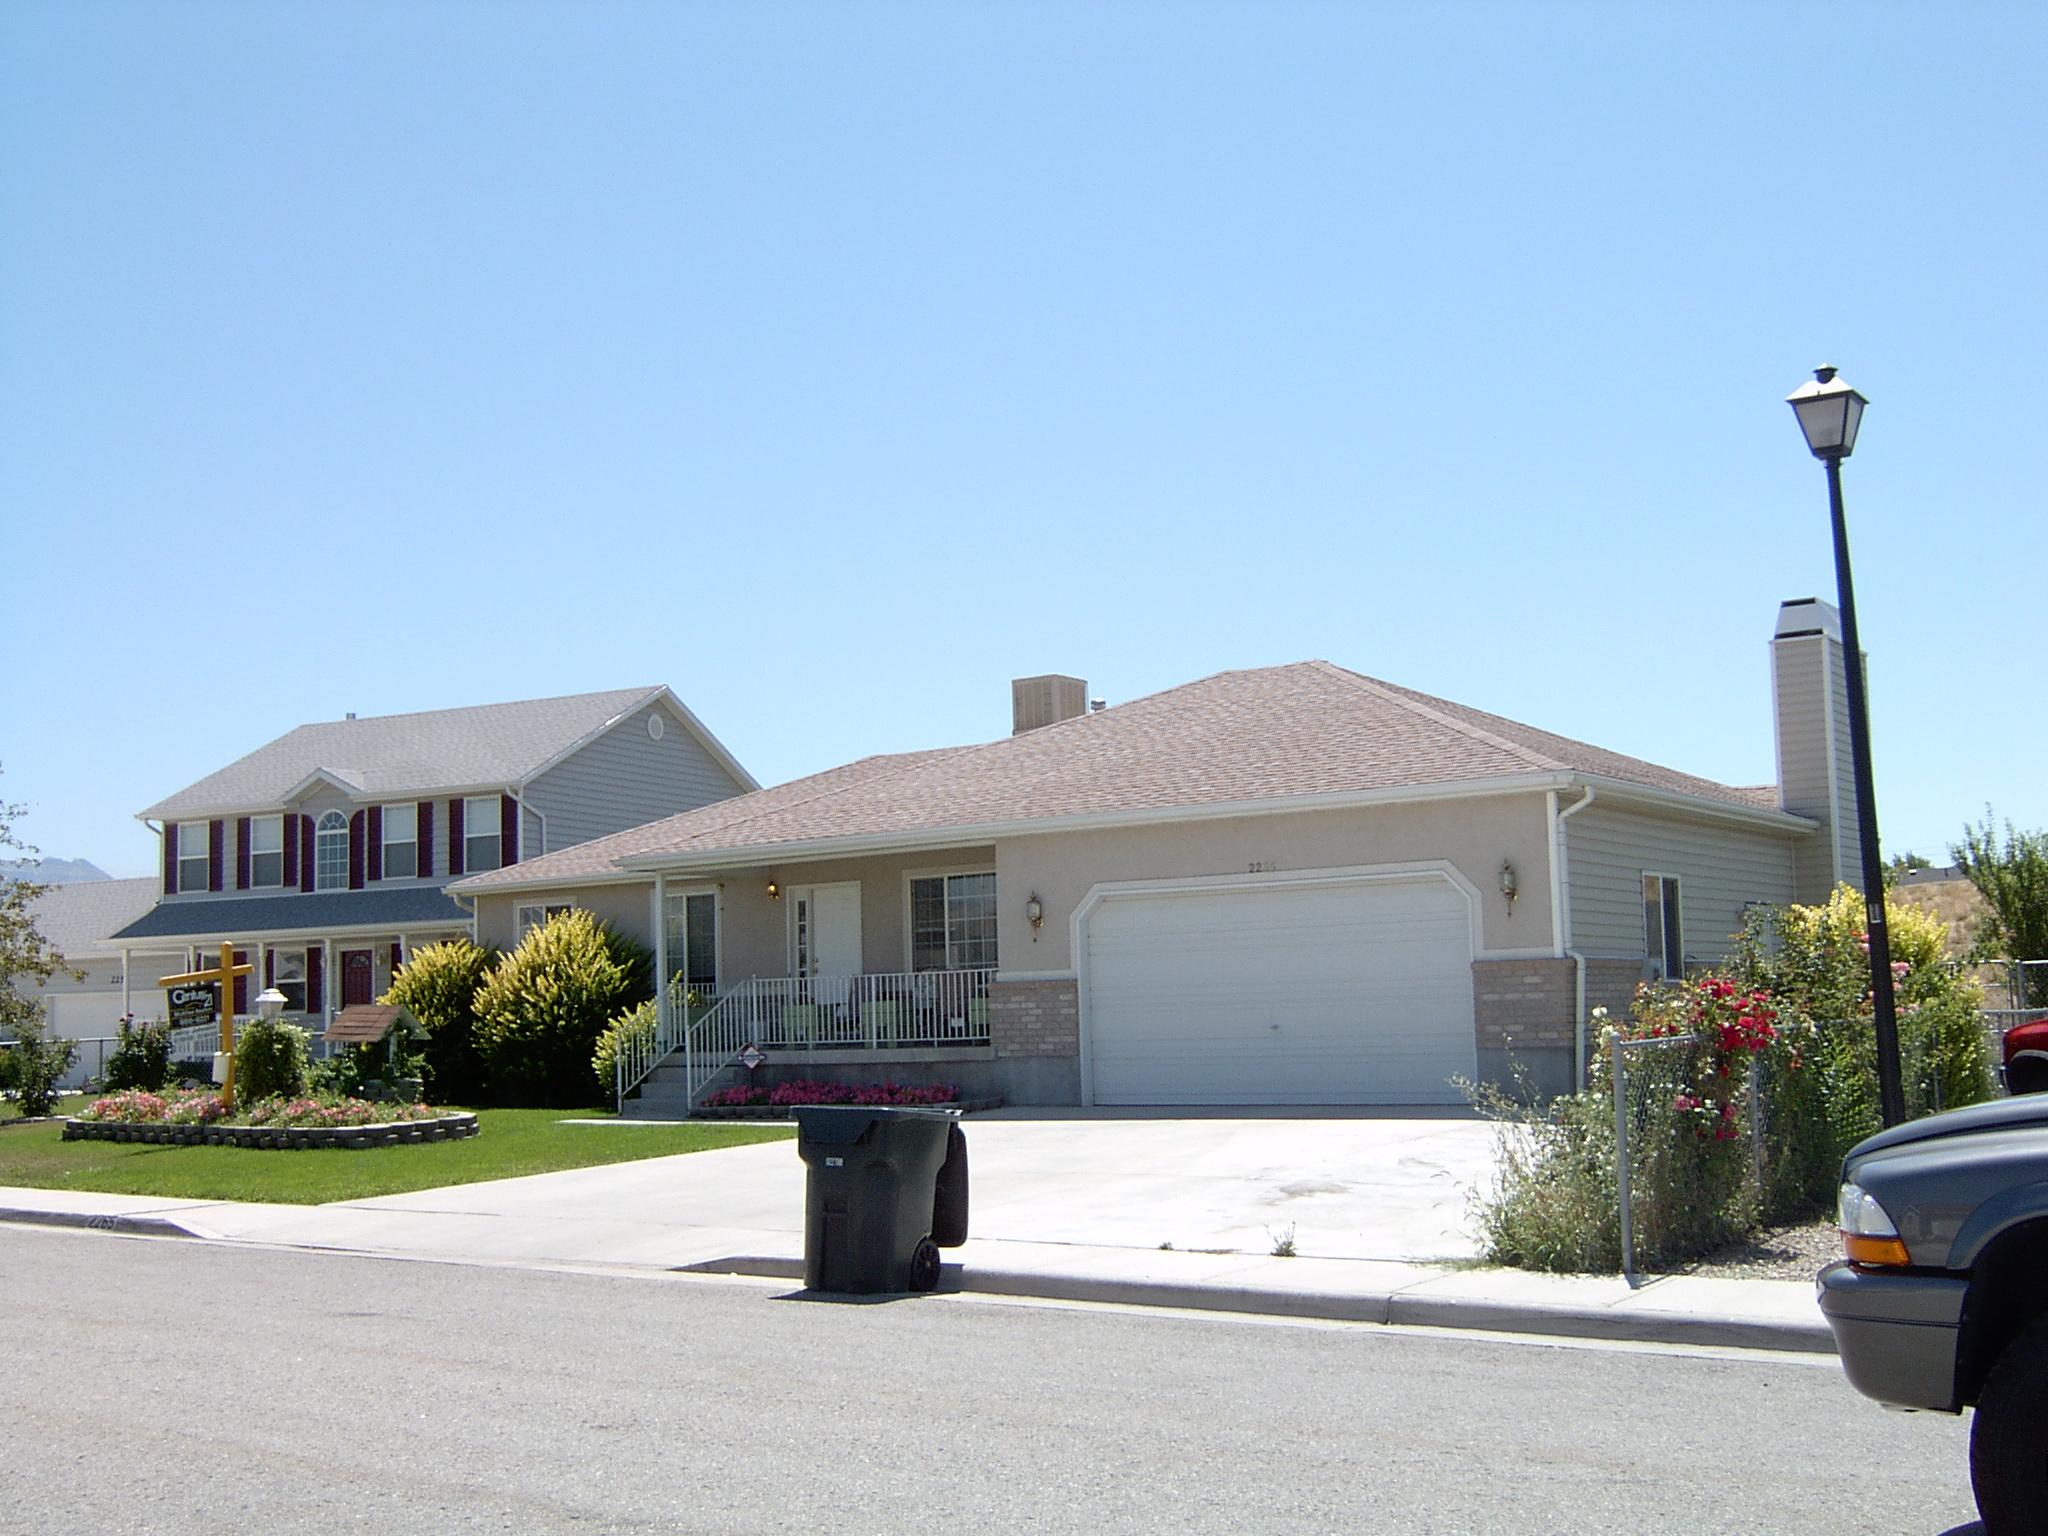 2004-1423P.JPG